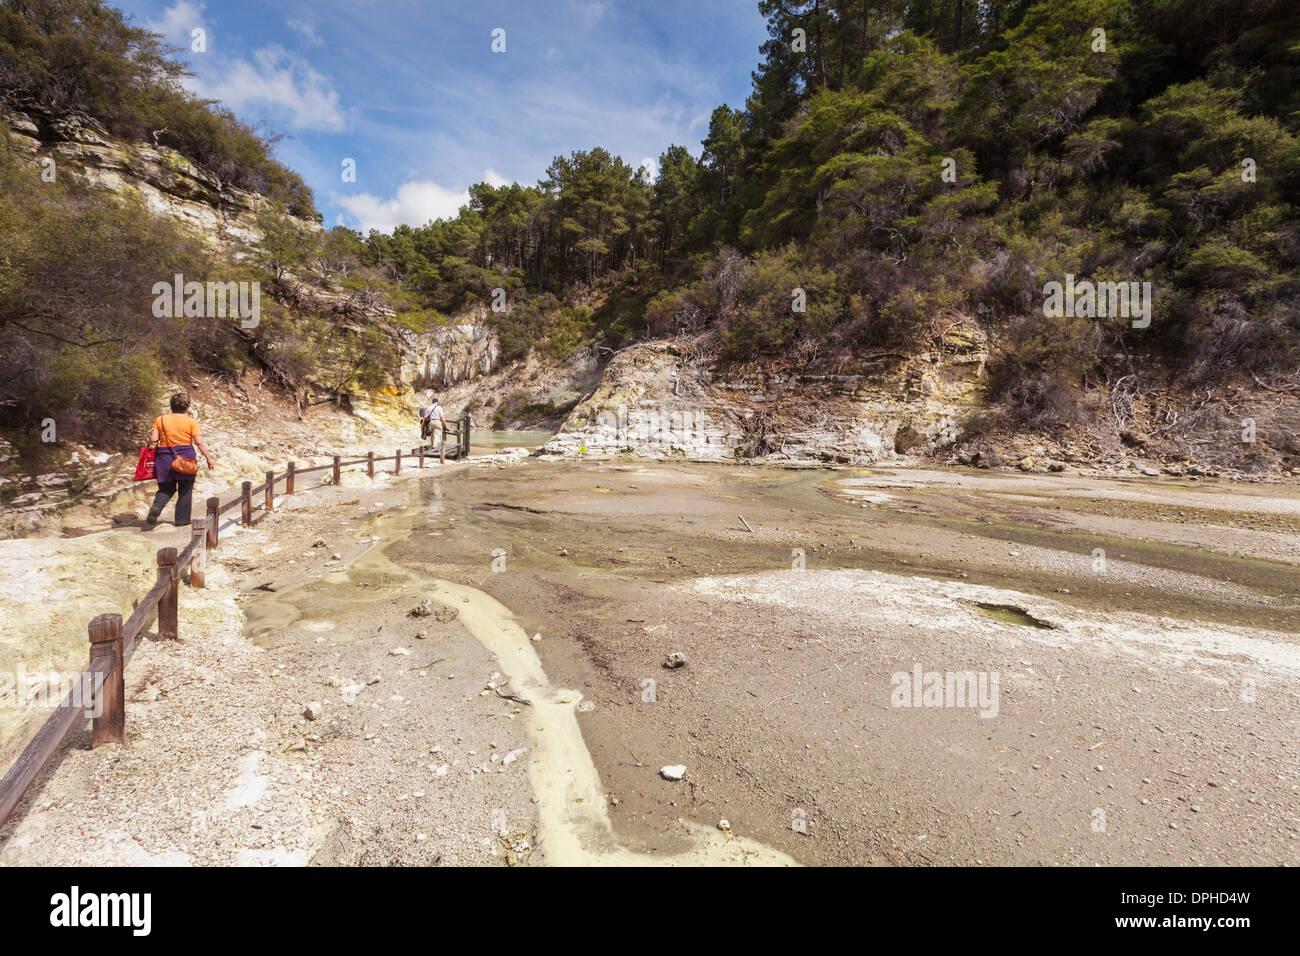 Tourists exploring Waiotapu Thermal Reserve, Rotorua, New Zealand. - Stock Image